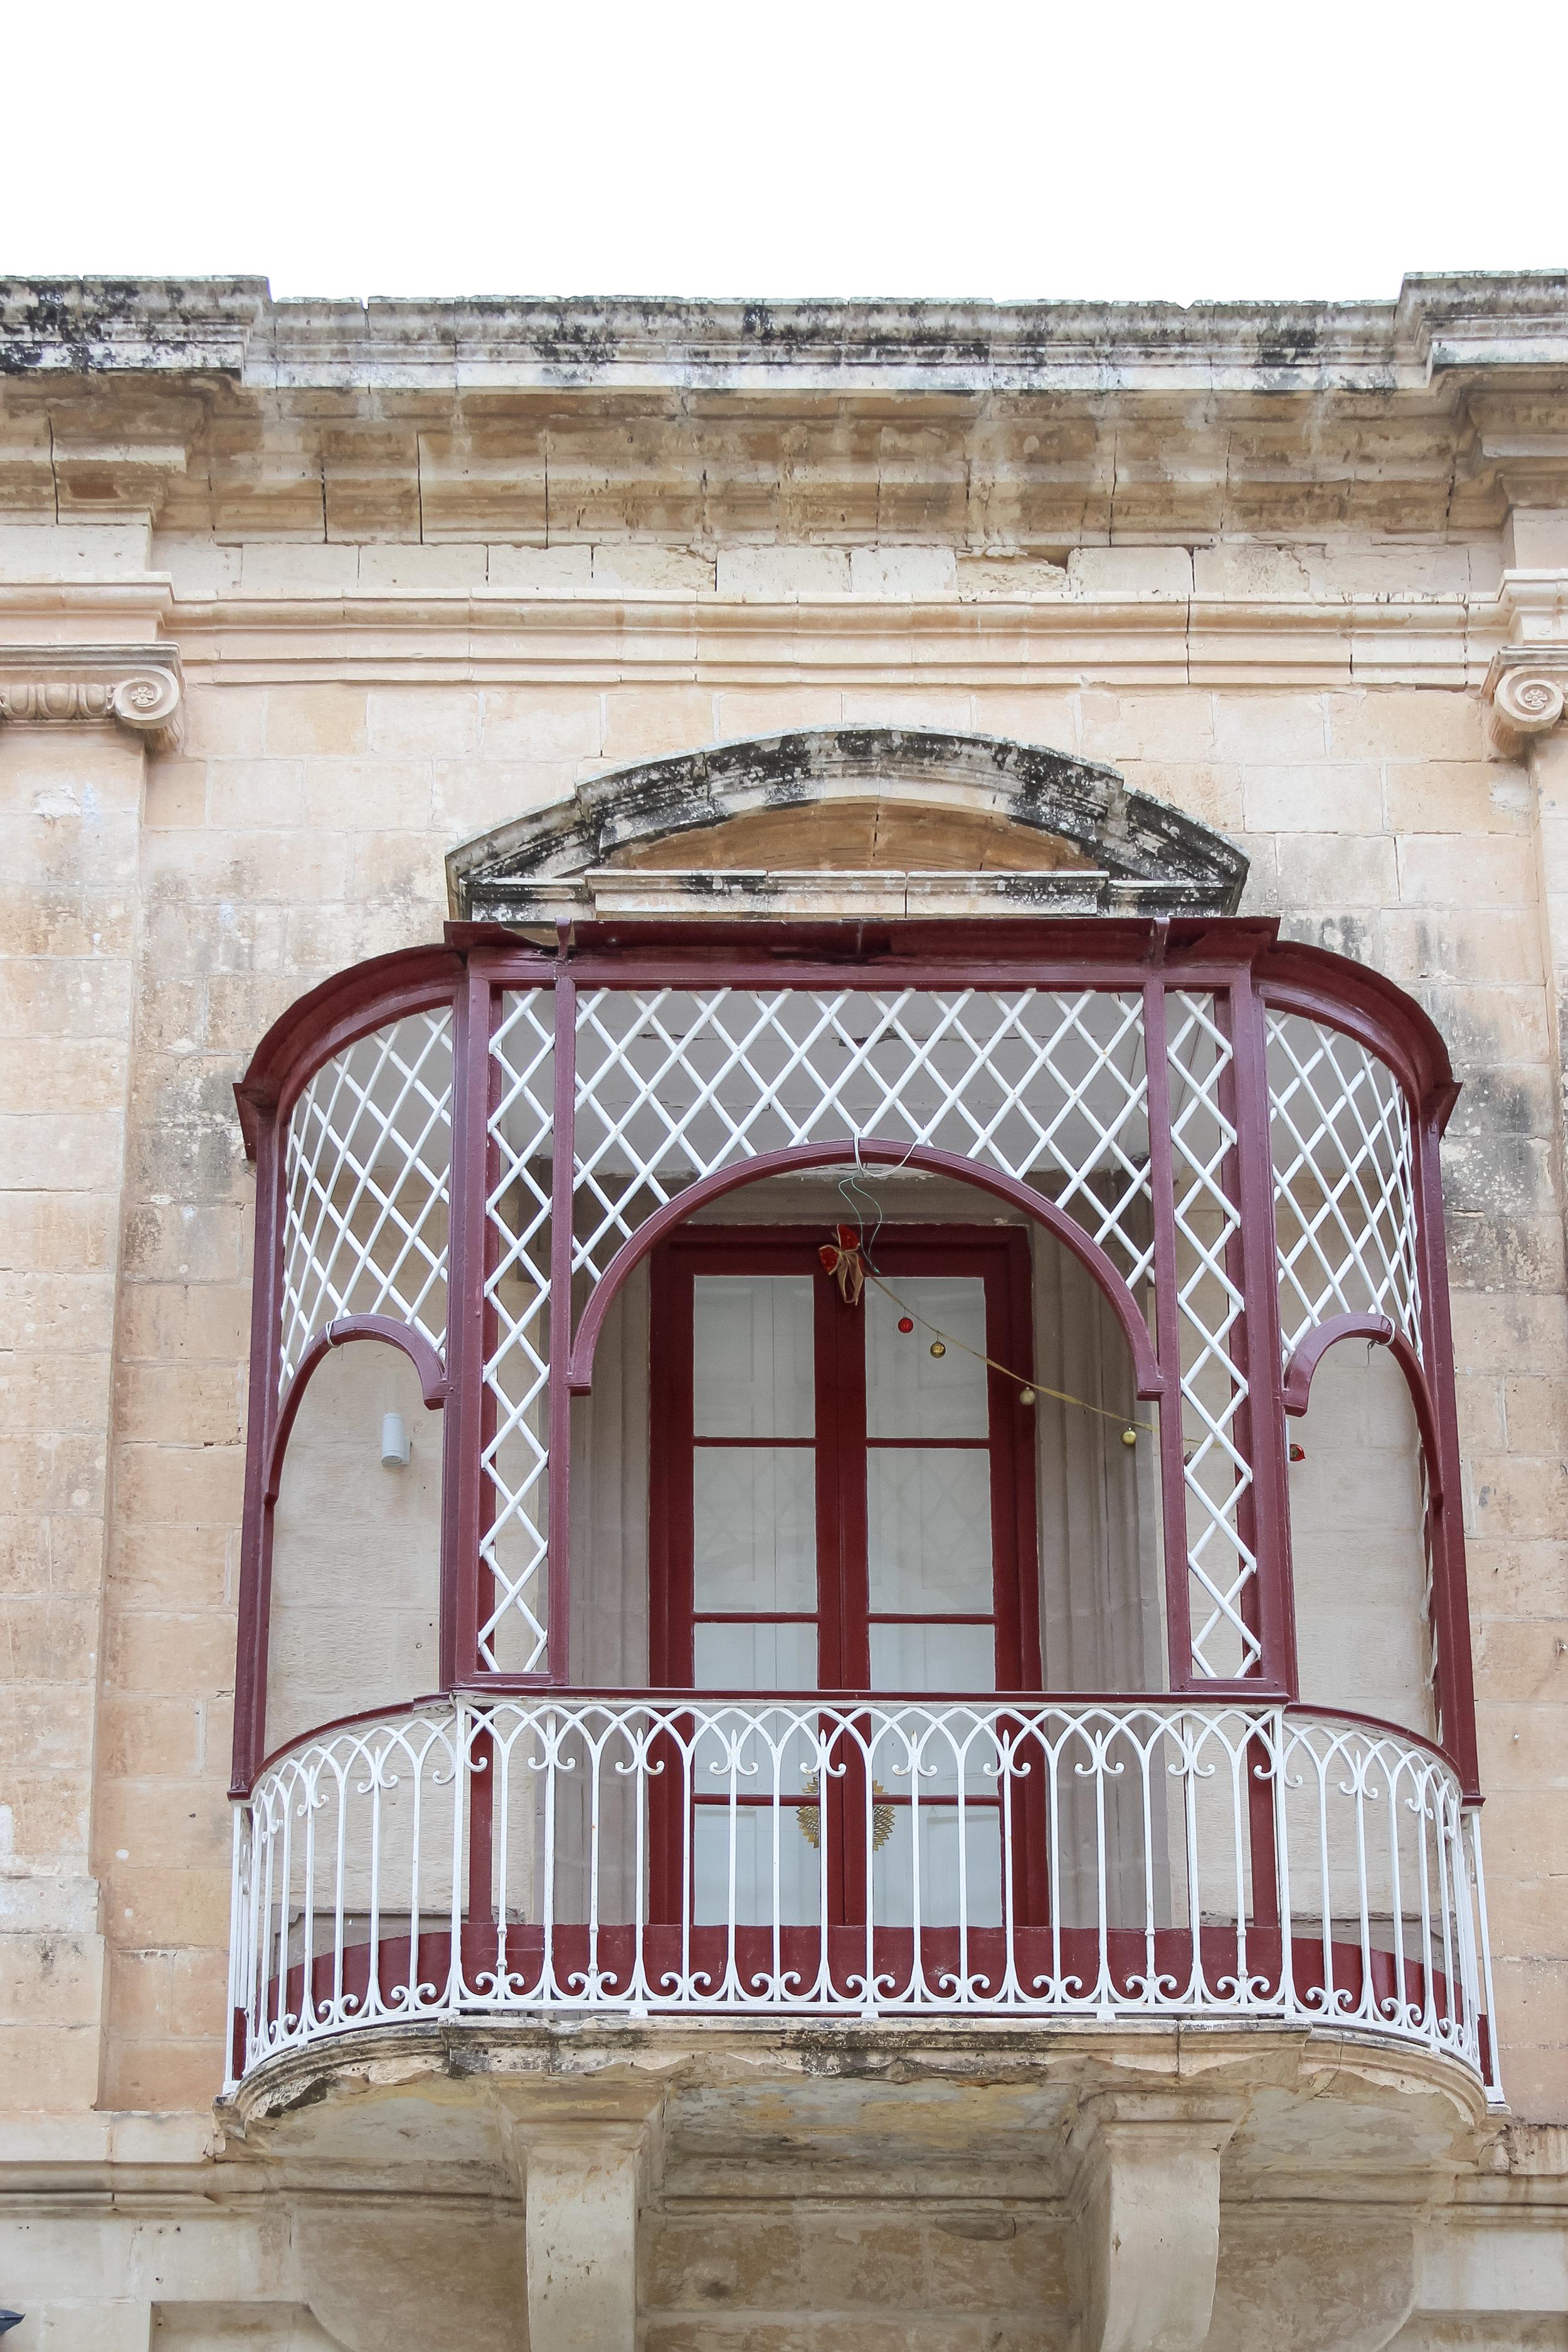 Maltese Balcony | Street of Malta | Mdina | - Thinking About Appreciation For Quality In Malta | Malta, Europe | DoLessGetMoreDone.com | - Canon Minimal Travel Documentary Photography - search for Liveability | Sustainability